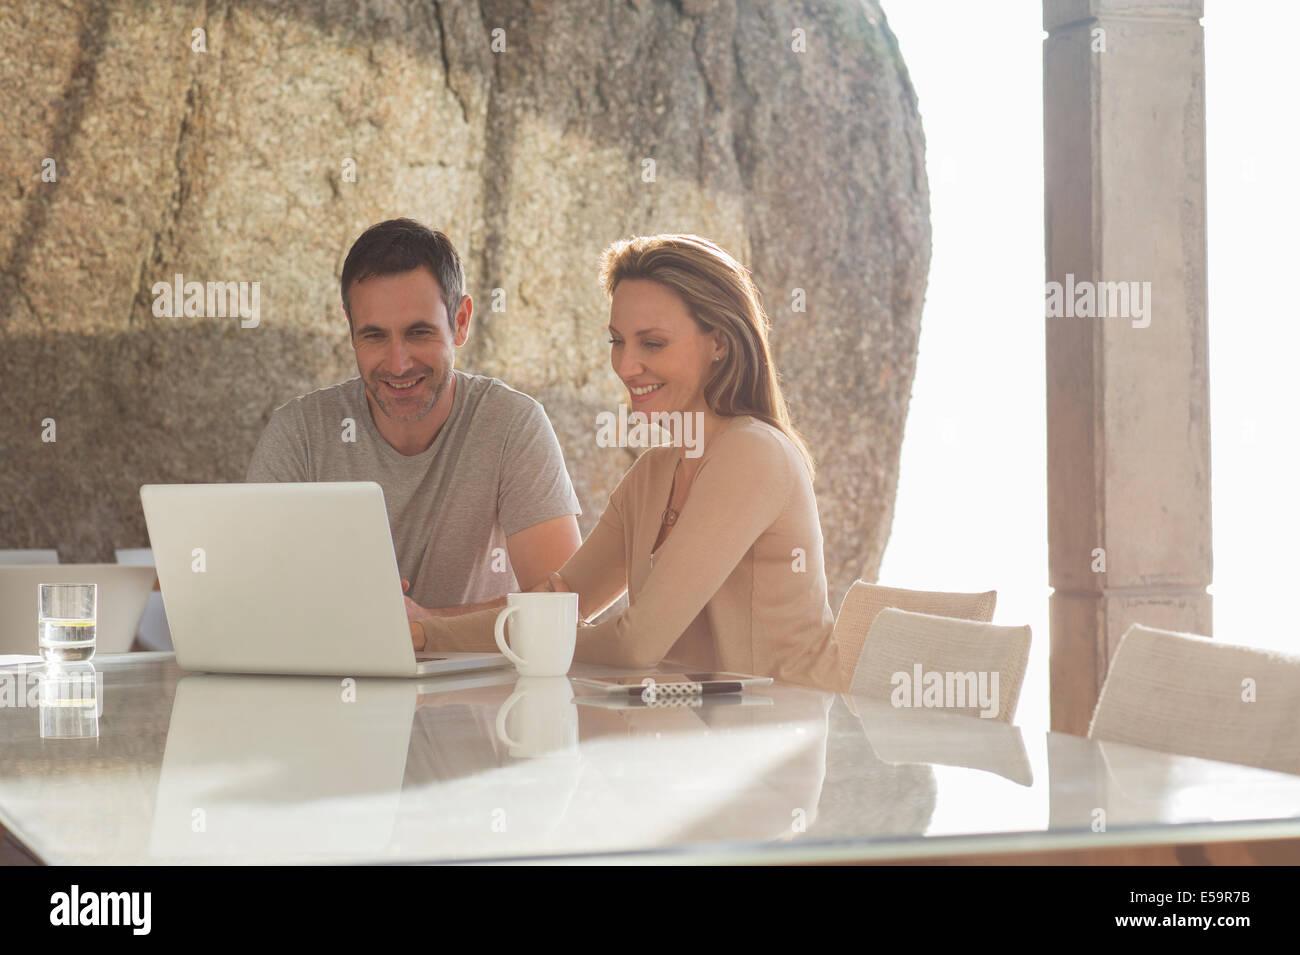 Paar mit Laptop beim Frühstück Stockbild